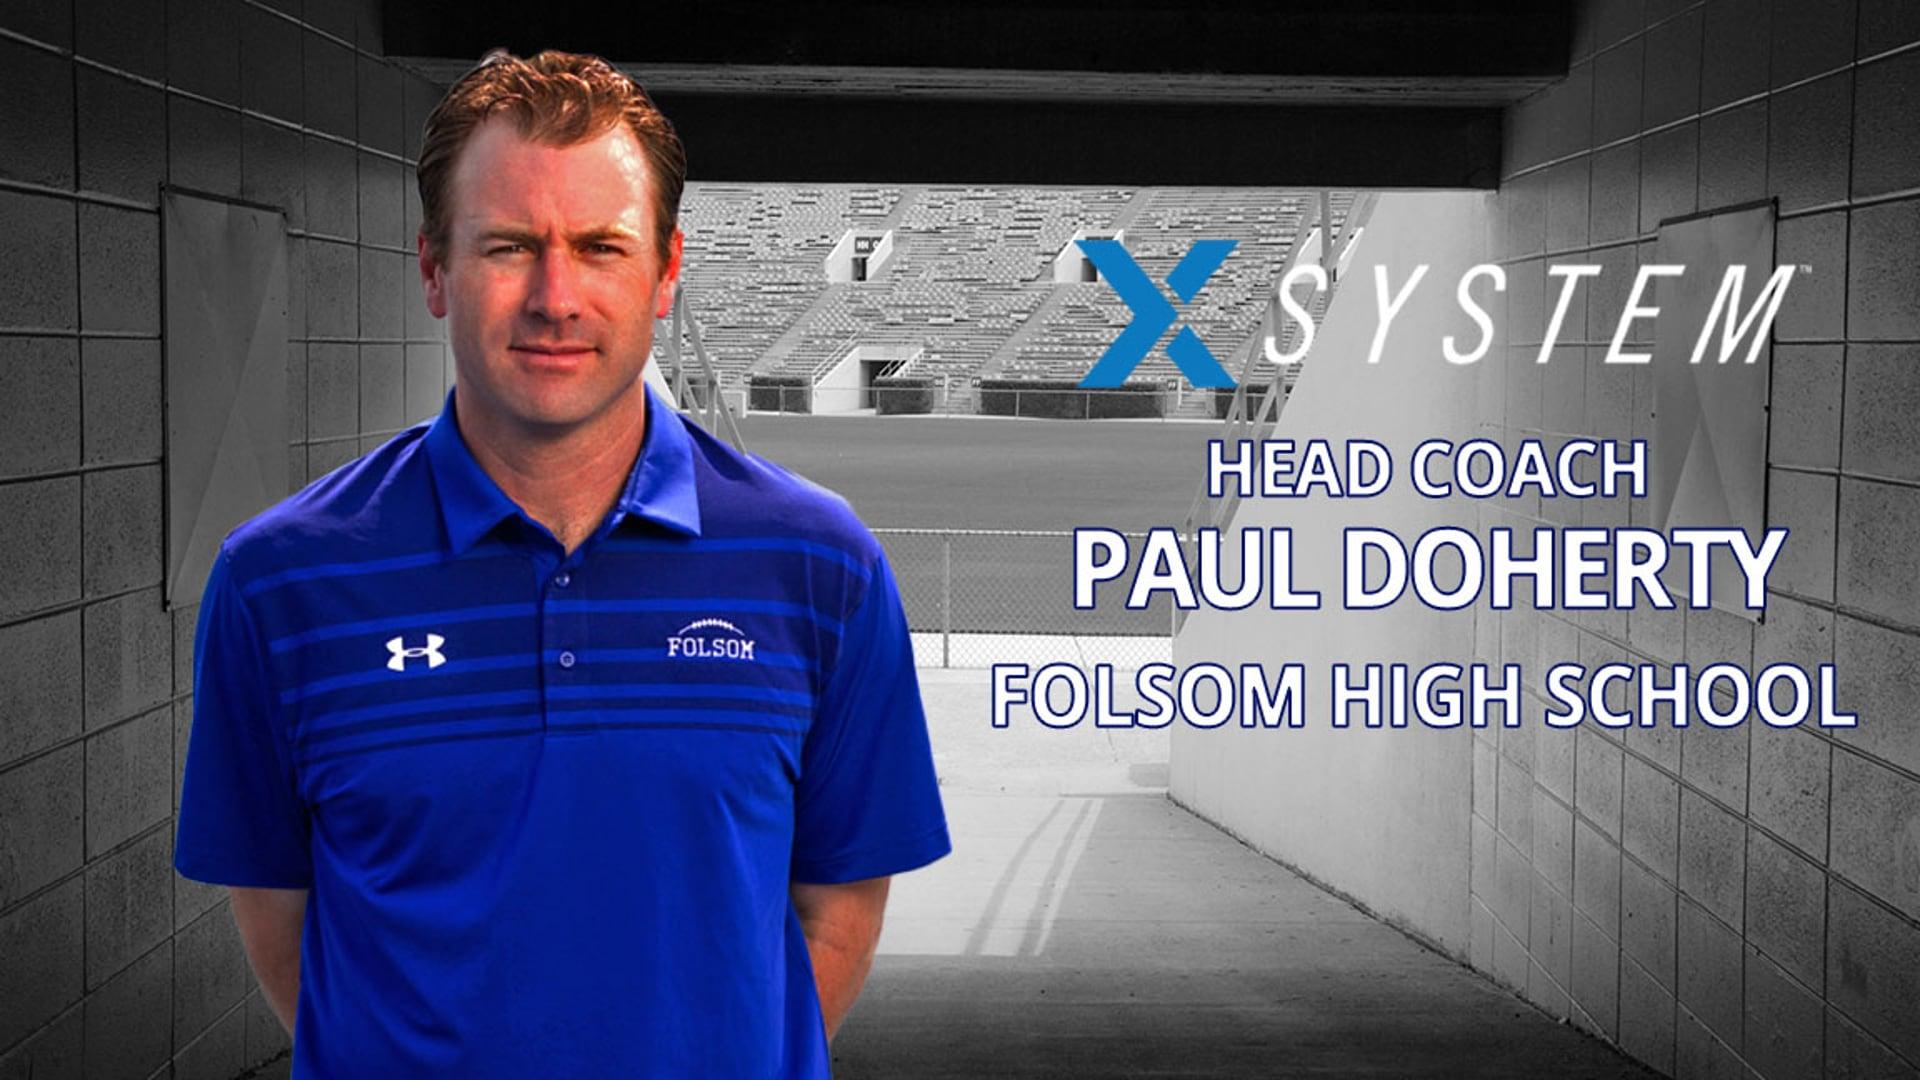 XSystem: Paul Doherty, Folsom High School